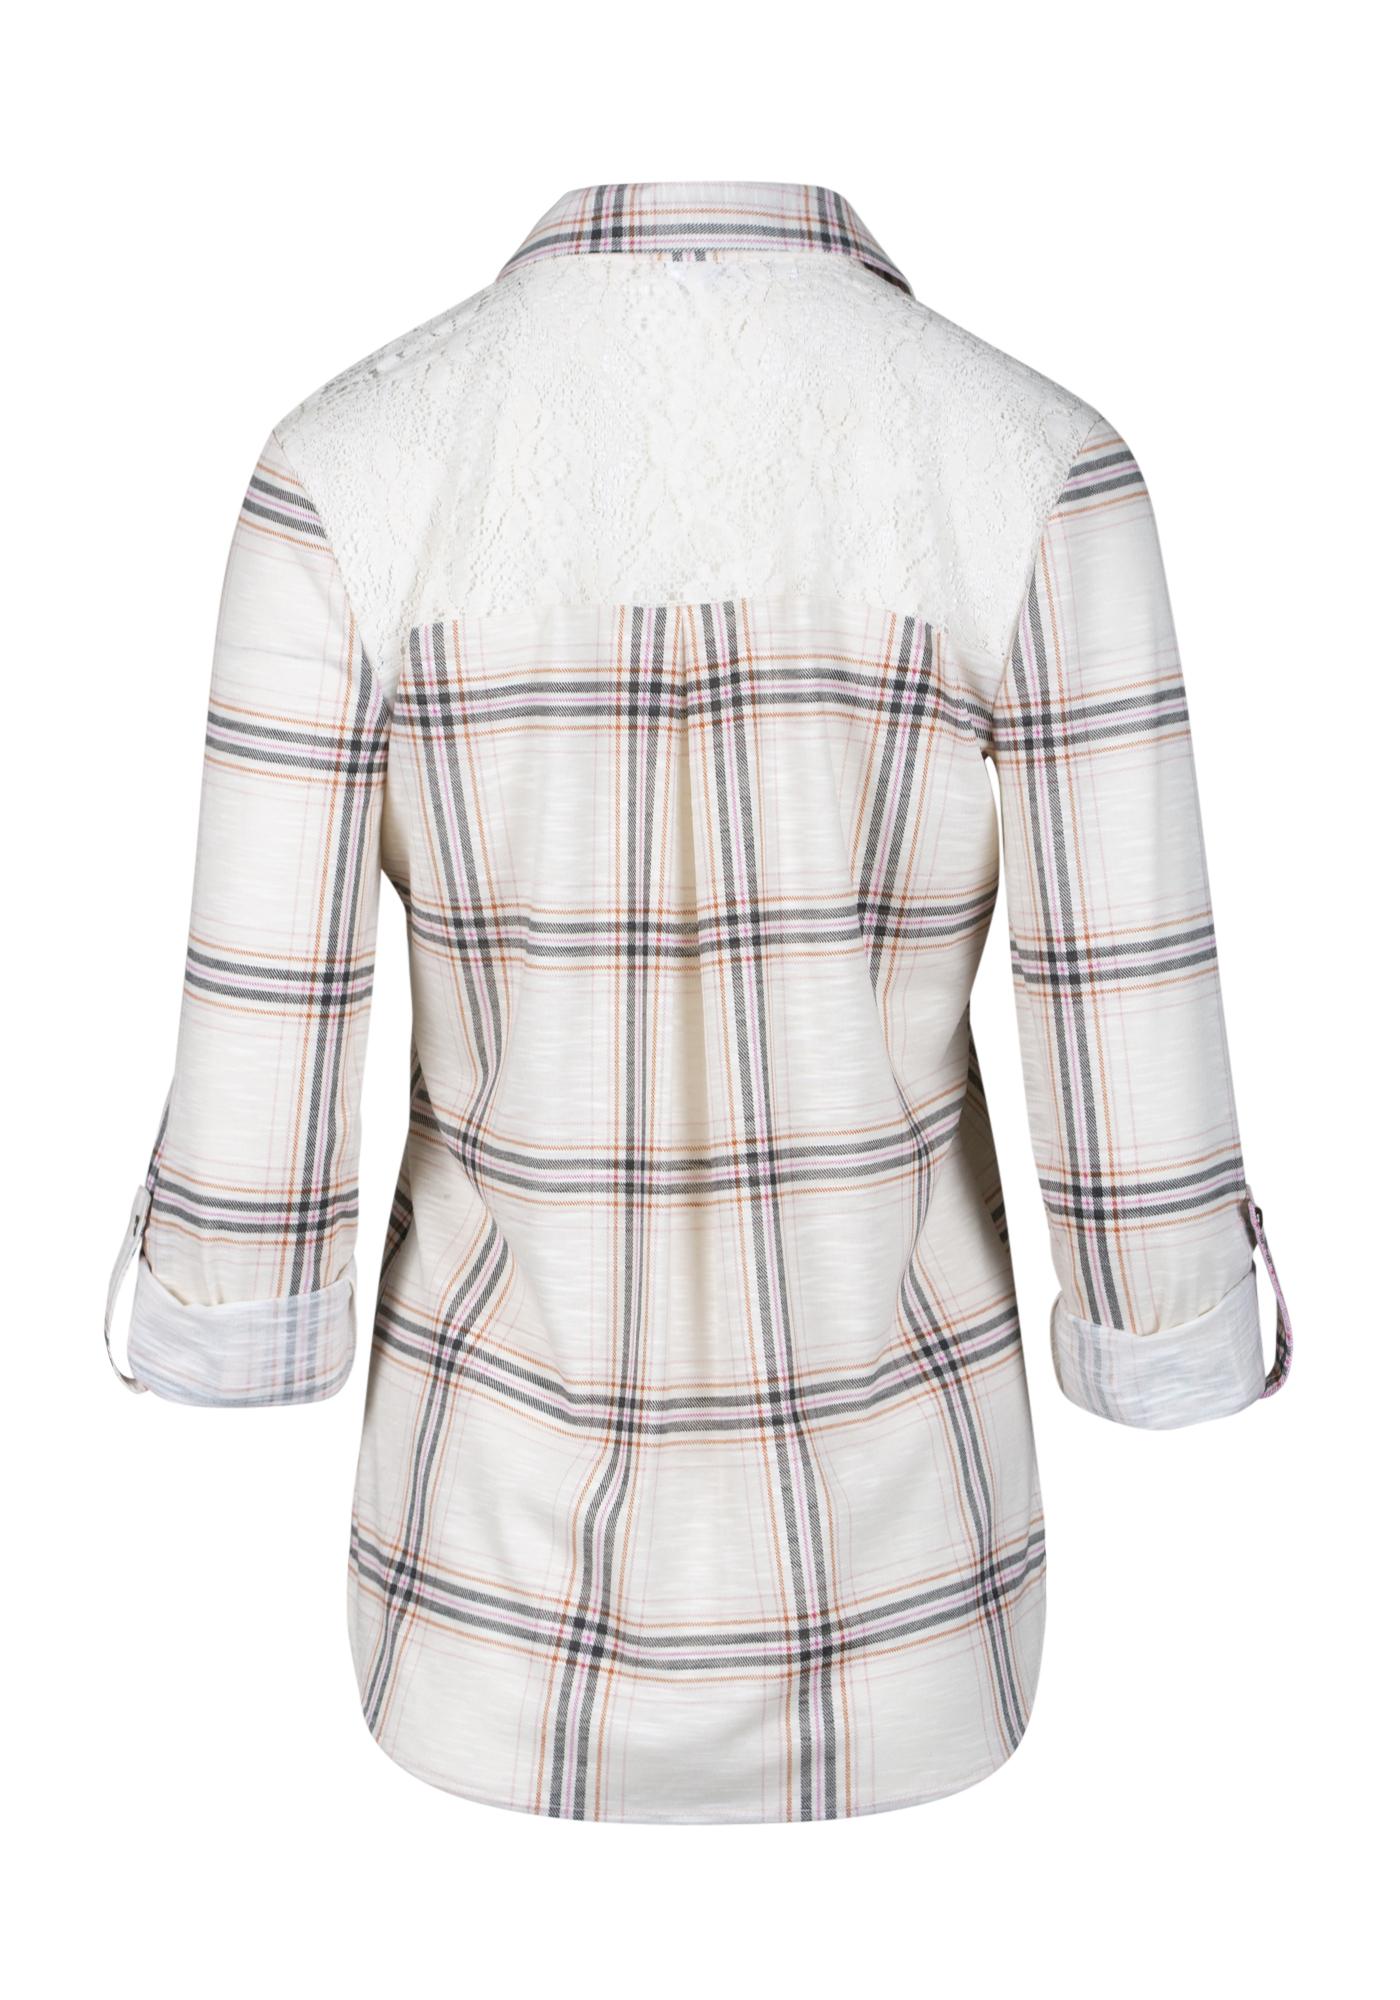 e193883a ... Womens Lace Trim Knit Plaid Shirt, LIGHT PINK, hi-res